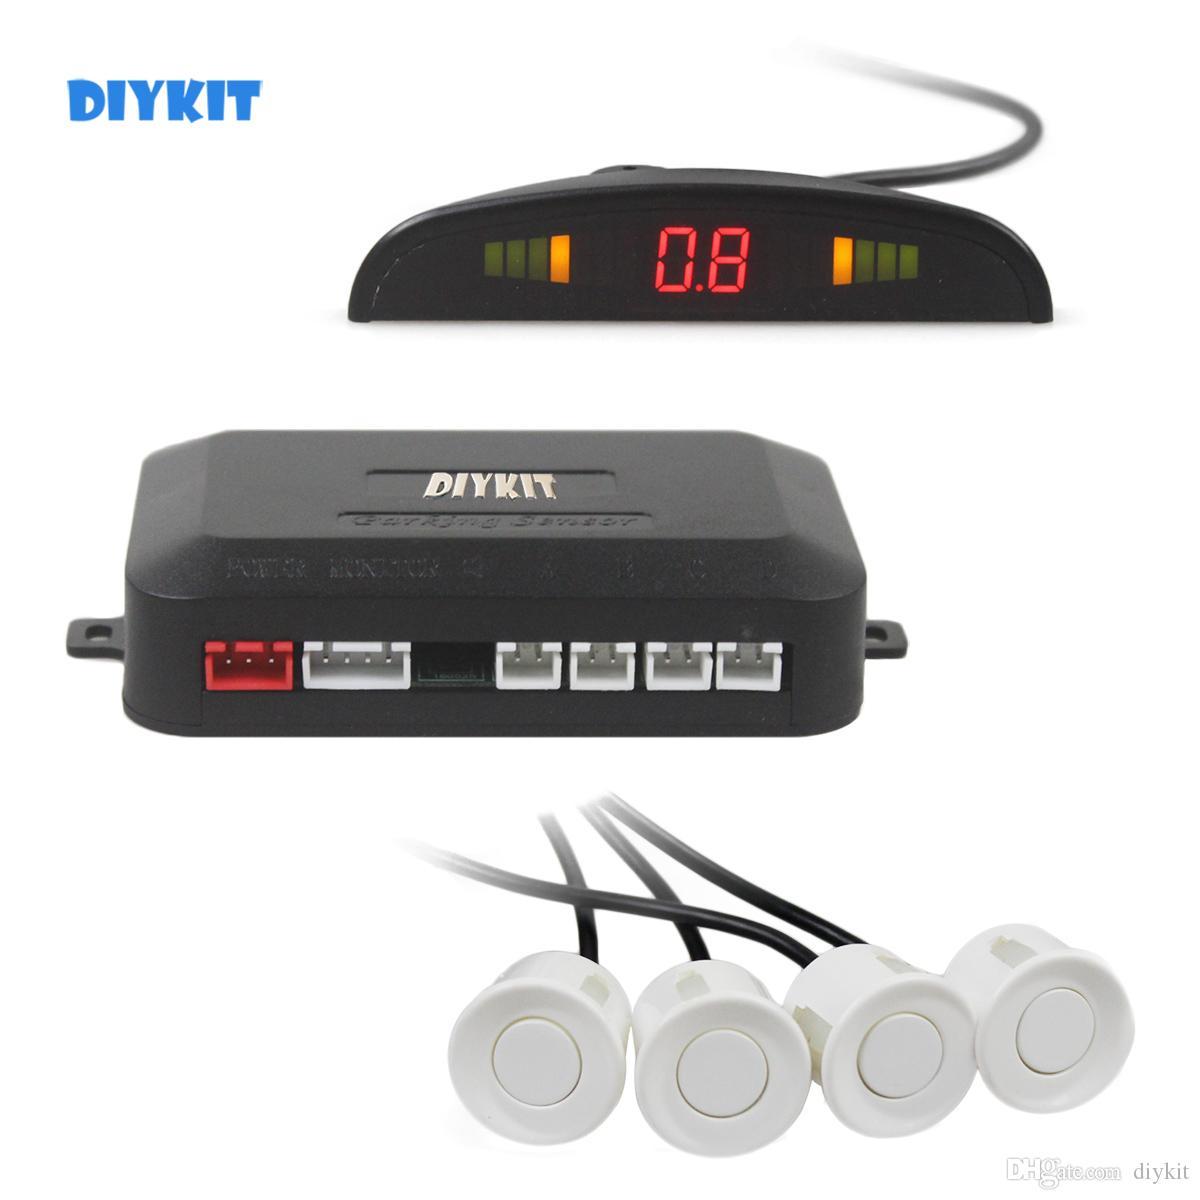 DIYKIT Car Parking Radar Sensors Backup Radar System with LED Backlight Display + 4 Sensors for Car Rear View System Kit